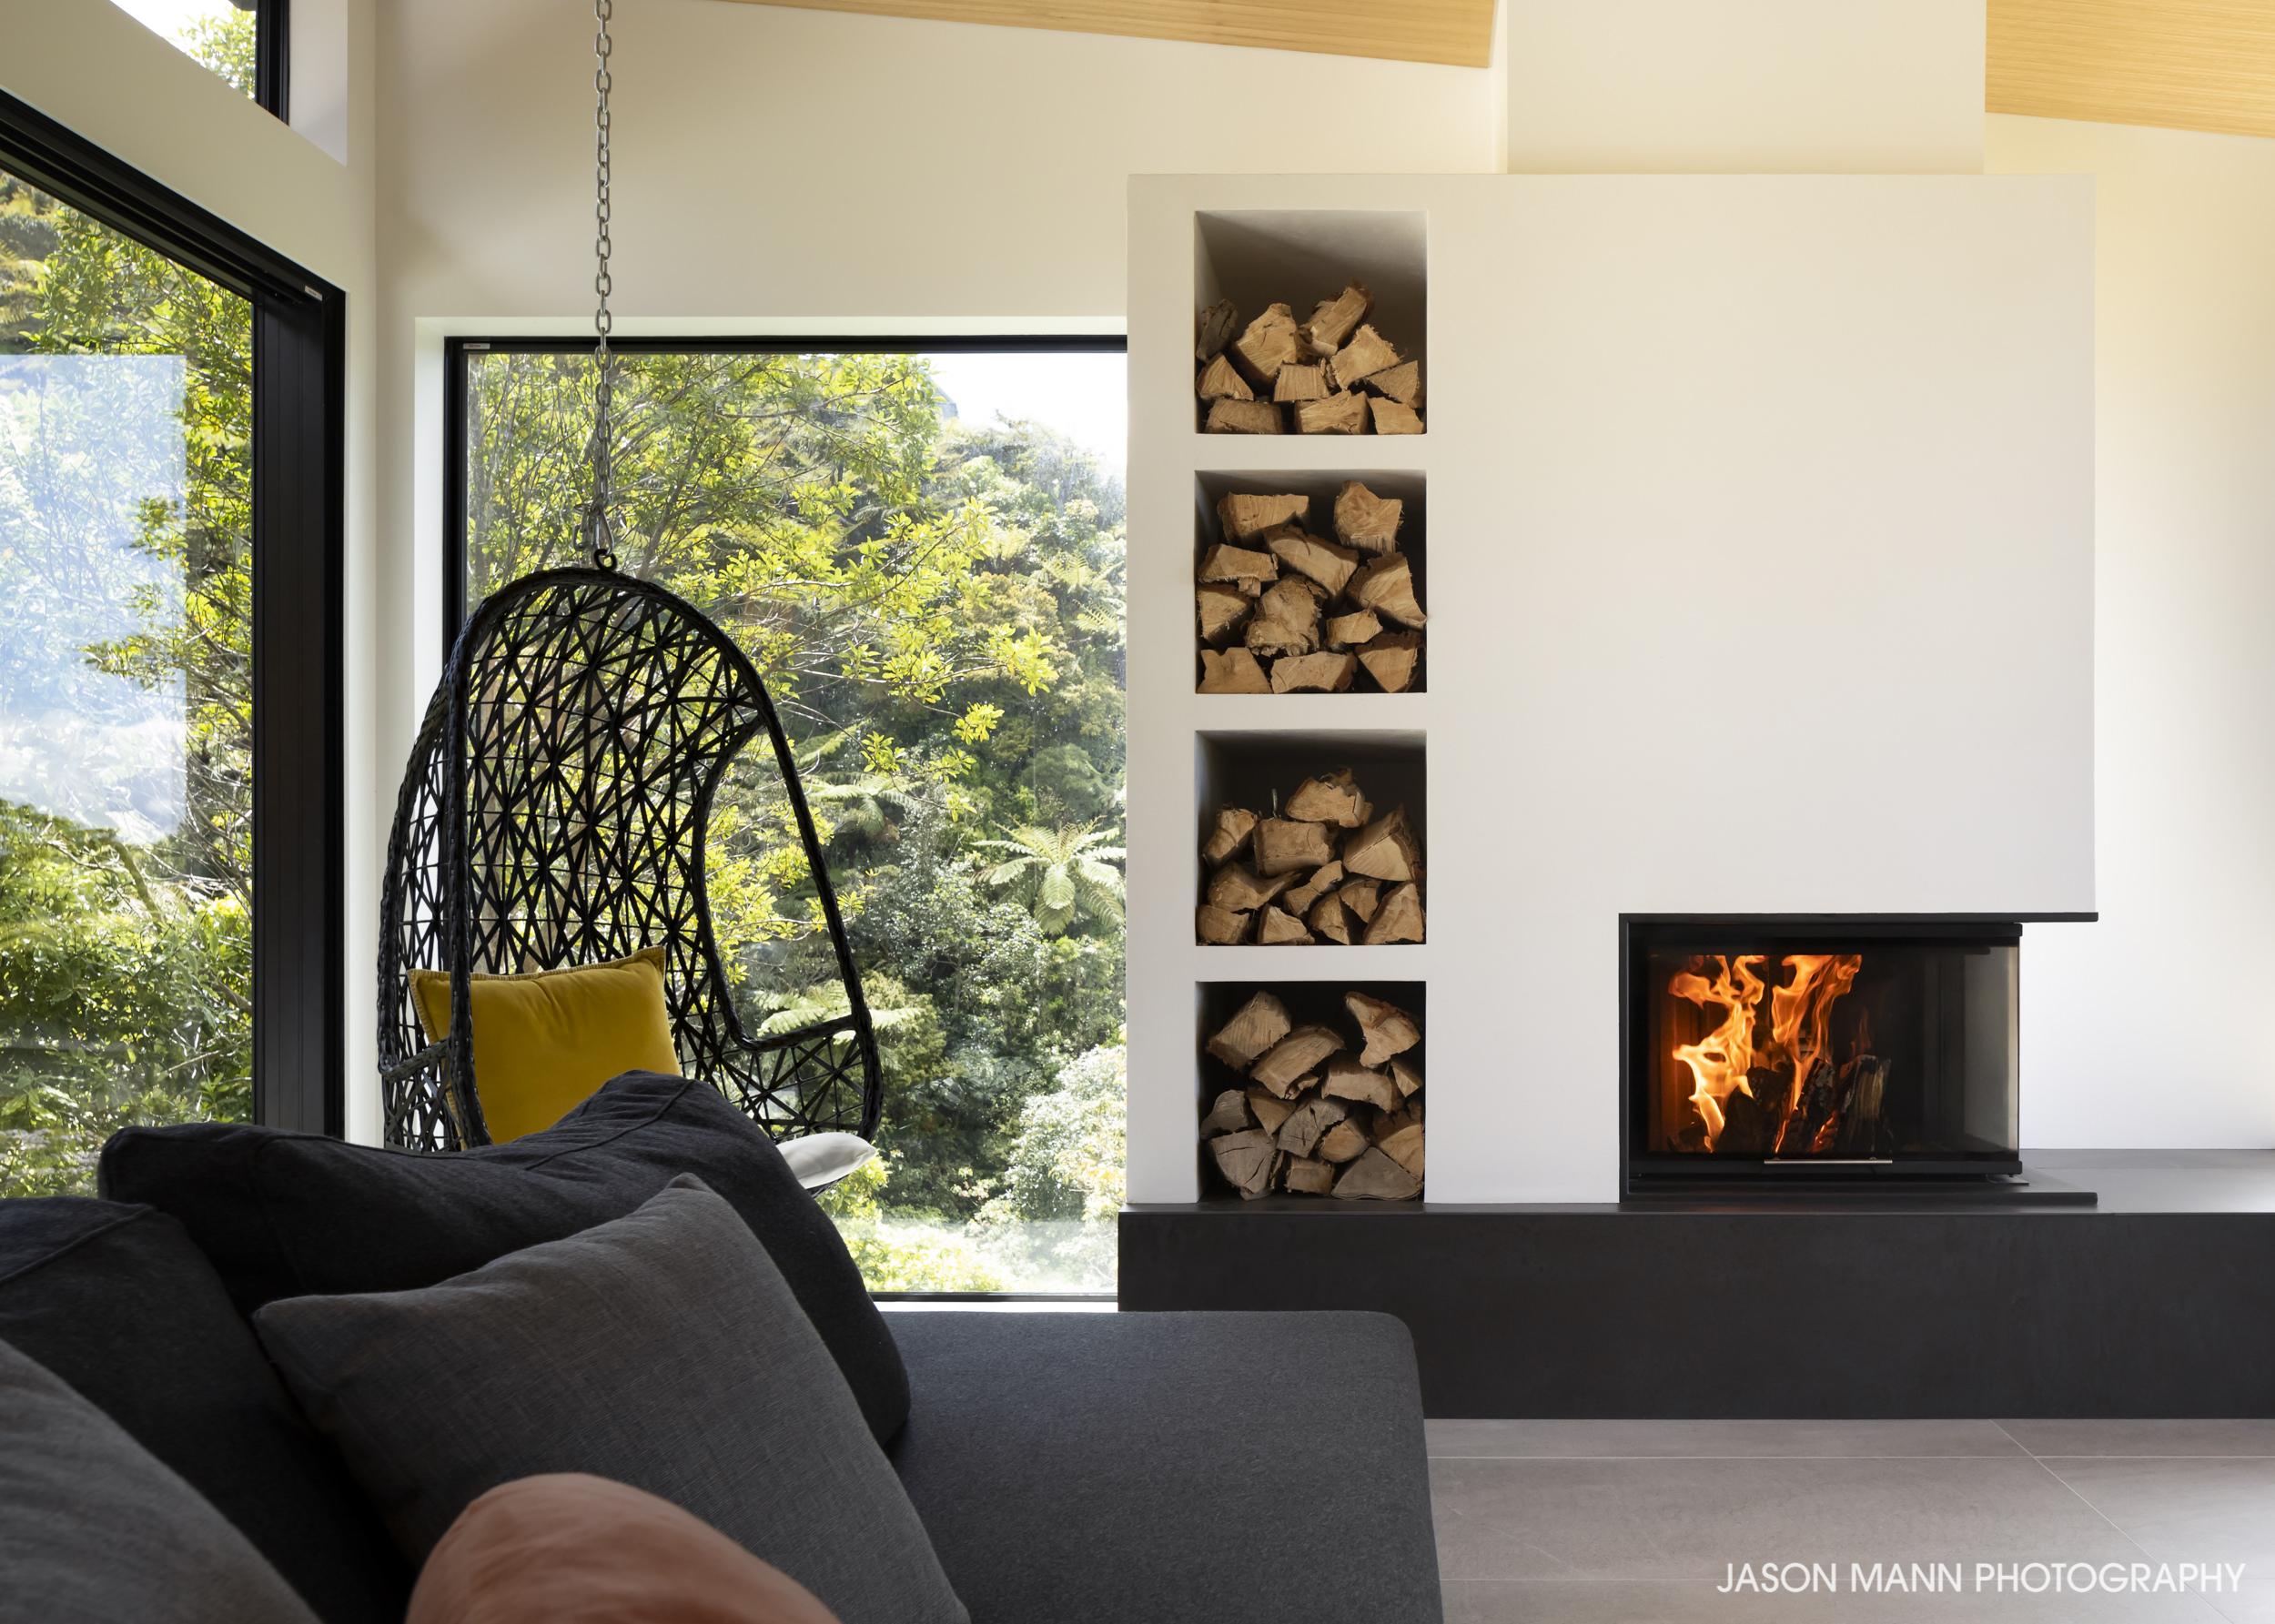 Jason_Mann_Fireplaces_09.jpg